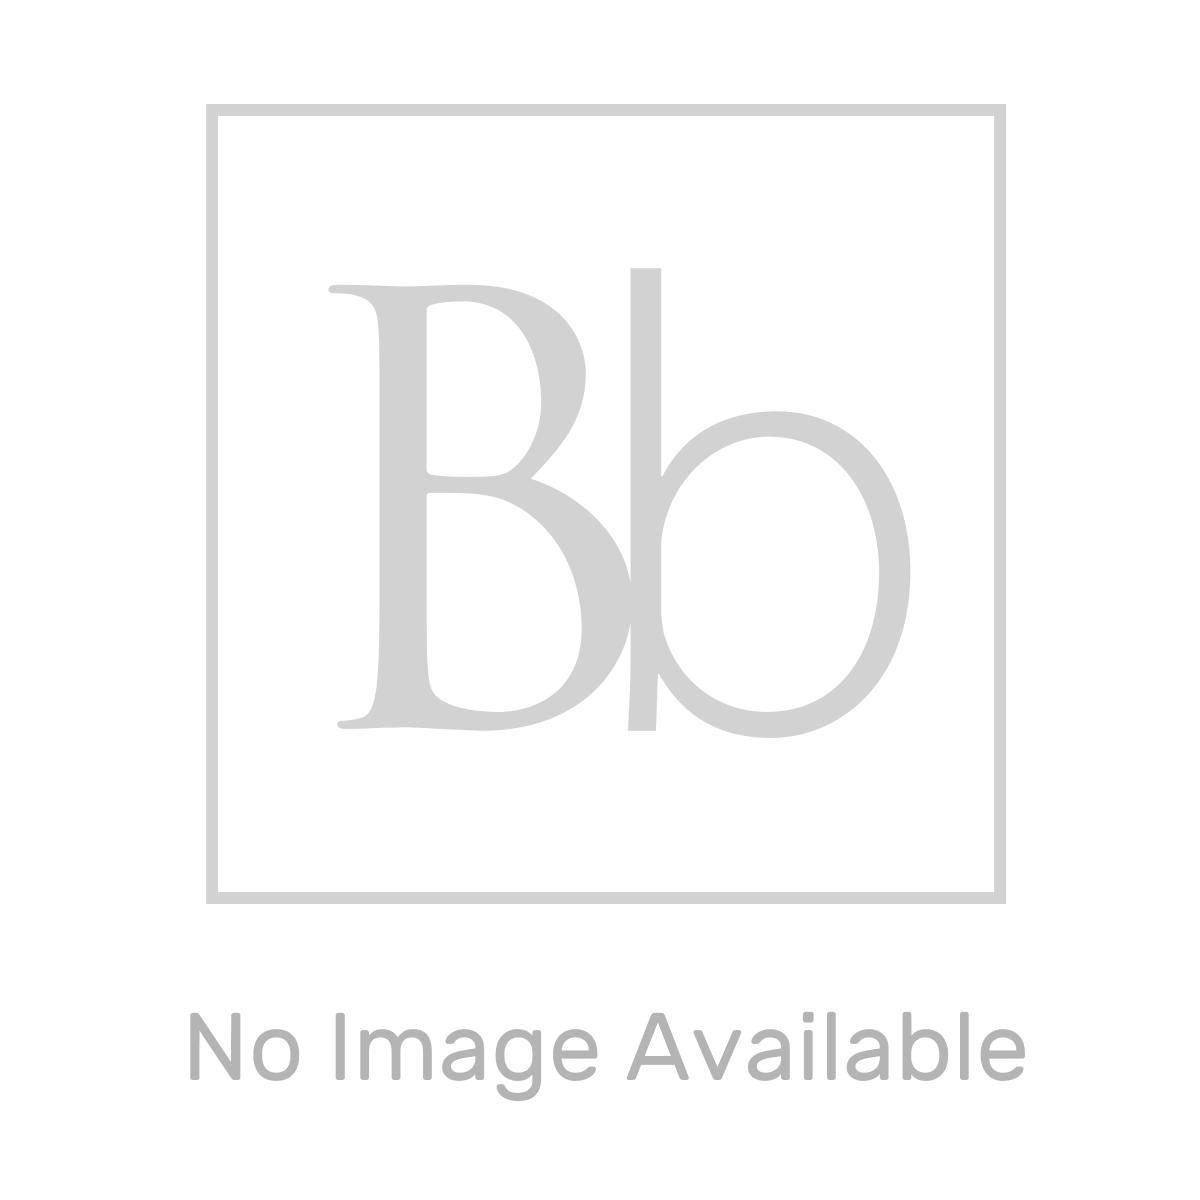 Aquadart White Slate Shower Tray 1200 x 700 Dimension